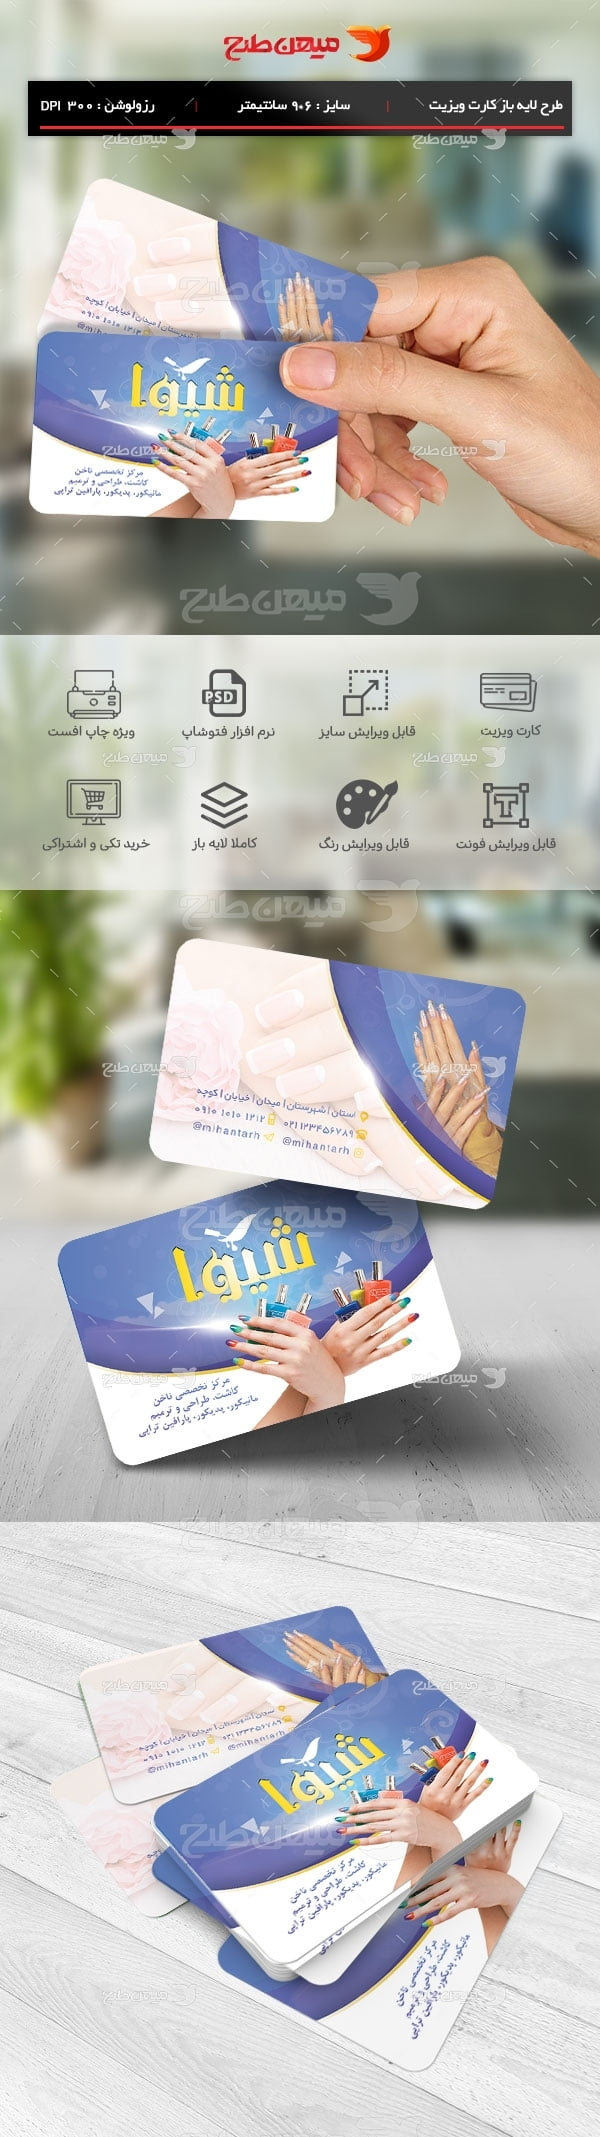 طرح لایه باز کارت ویزیت کاشت ناخن